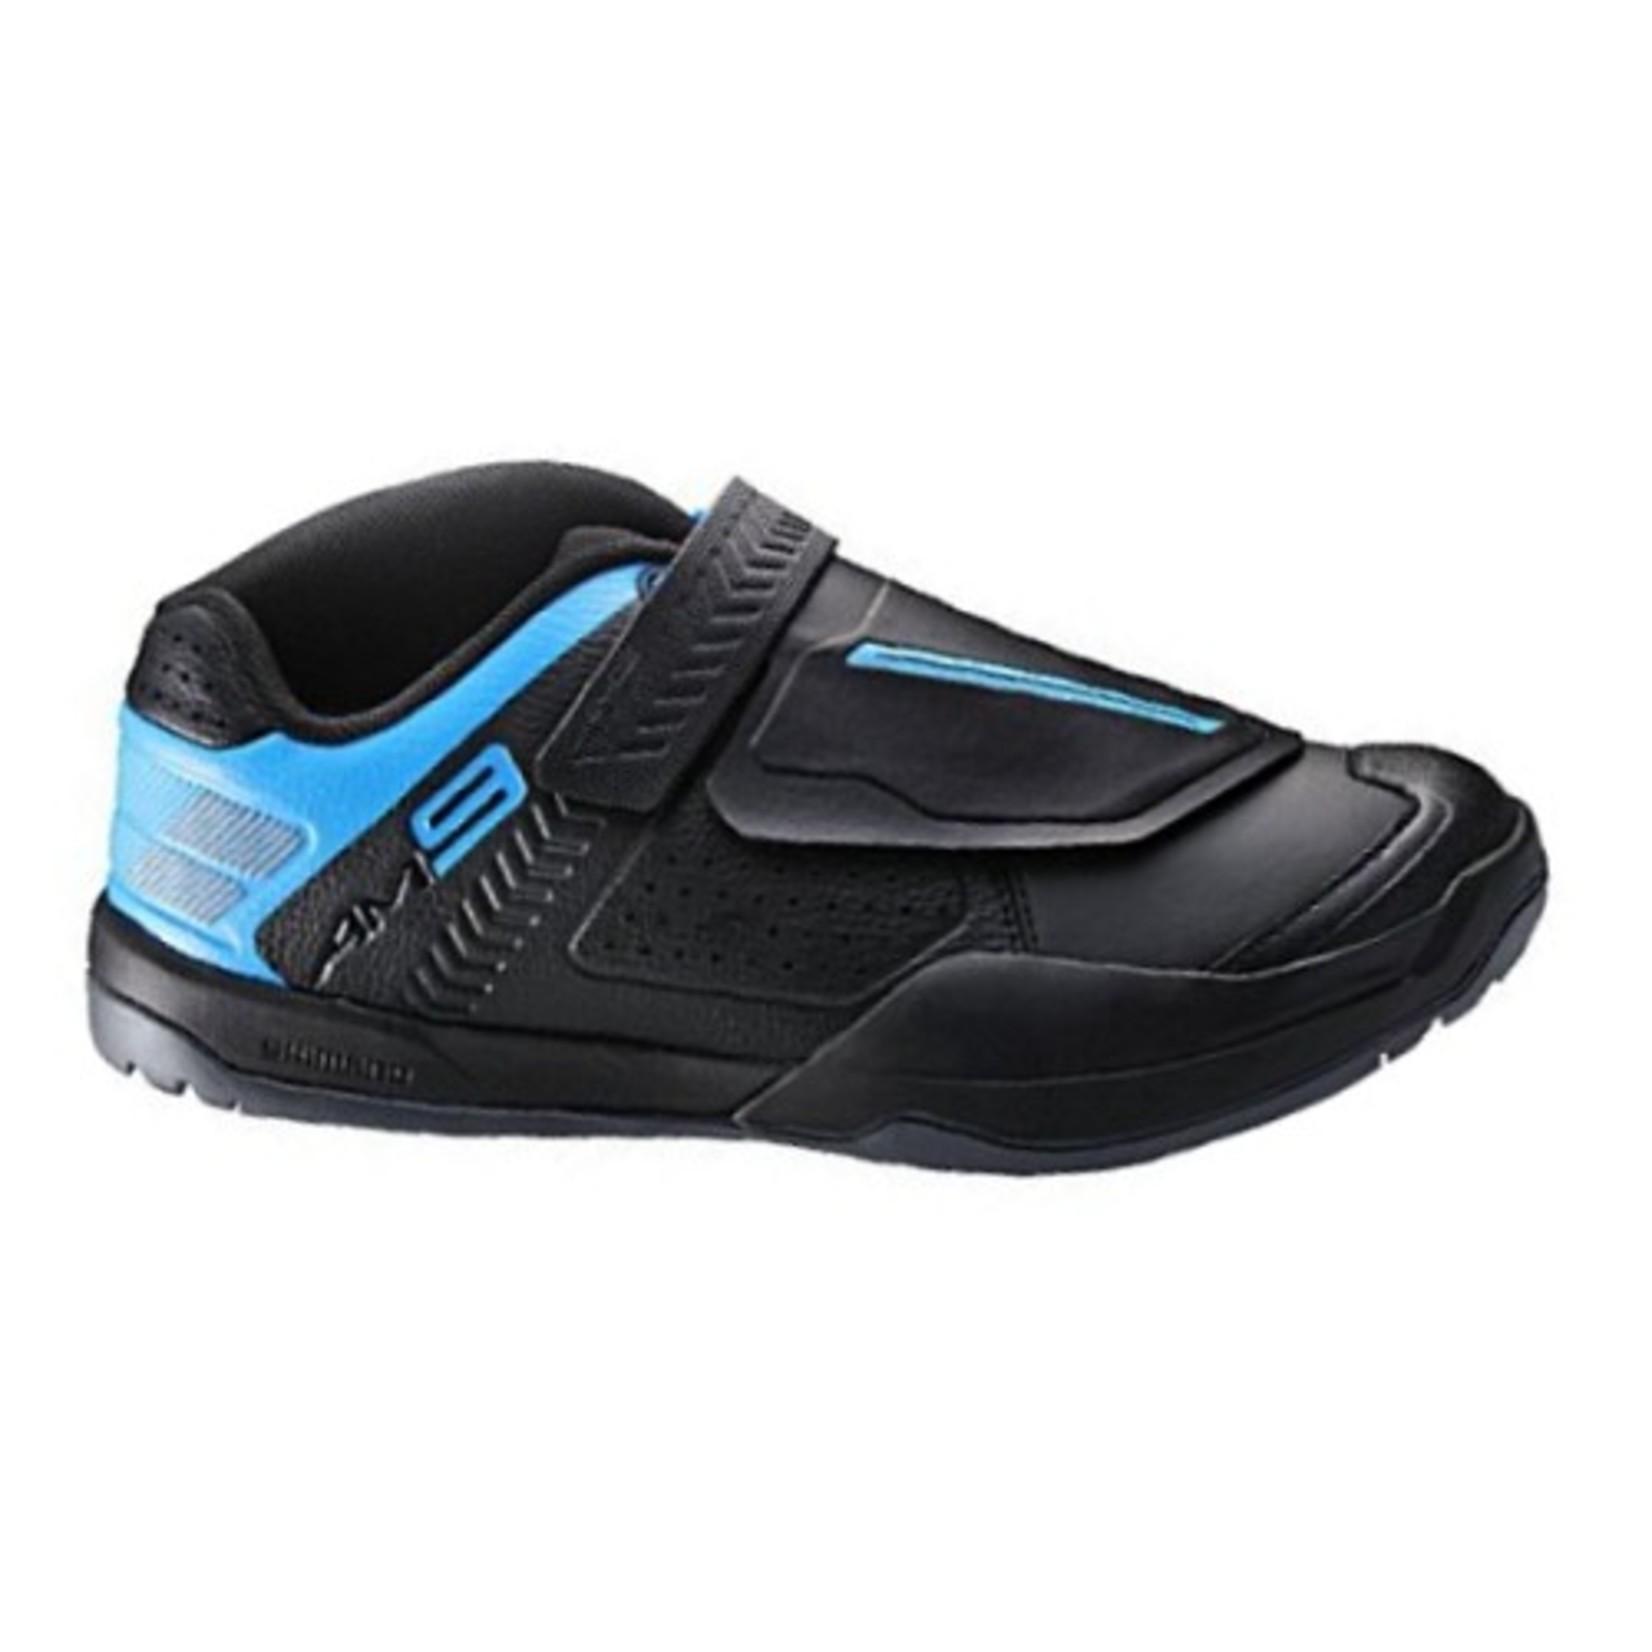 Shimano Shimano  SH-AM9 Bicycle Shoes